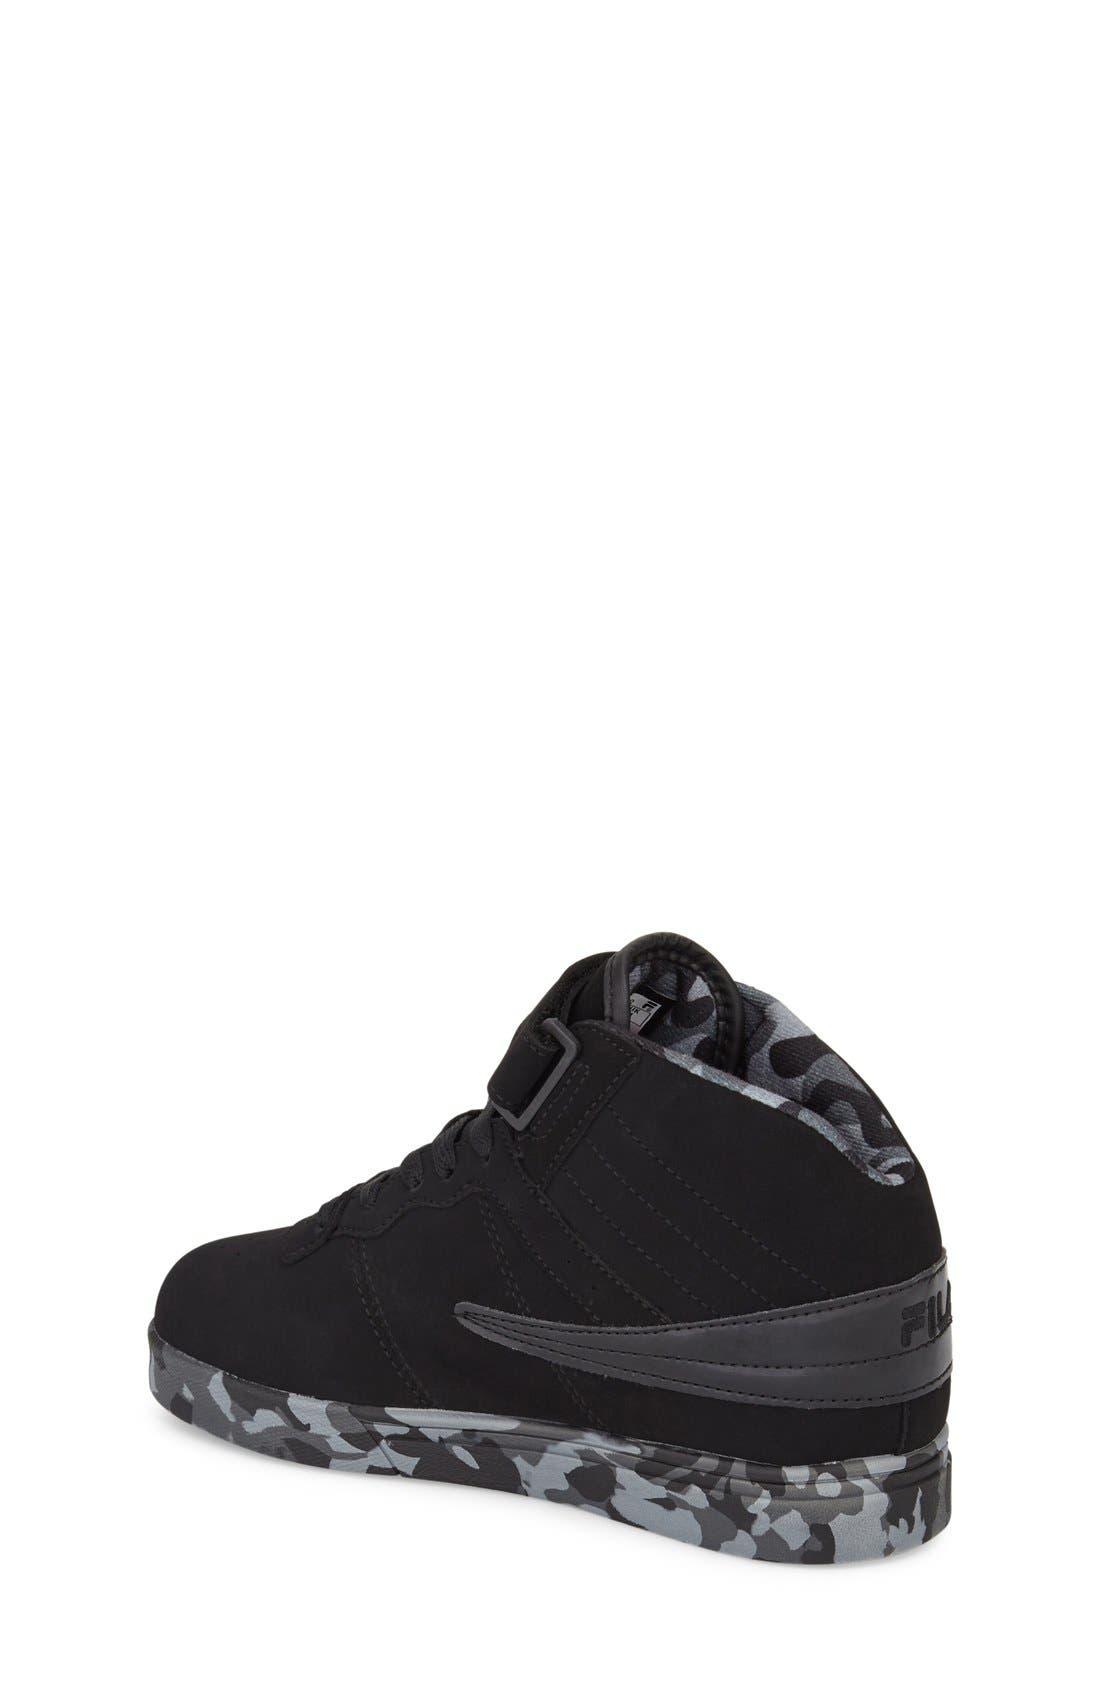 Vulc 13 Mashup High Top Sneaker,                             Alternate thumbnail 5, color,